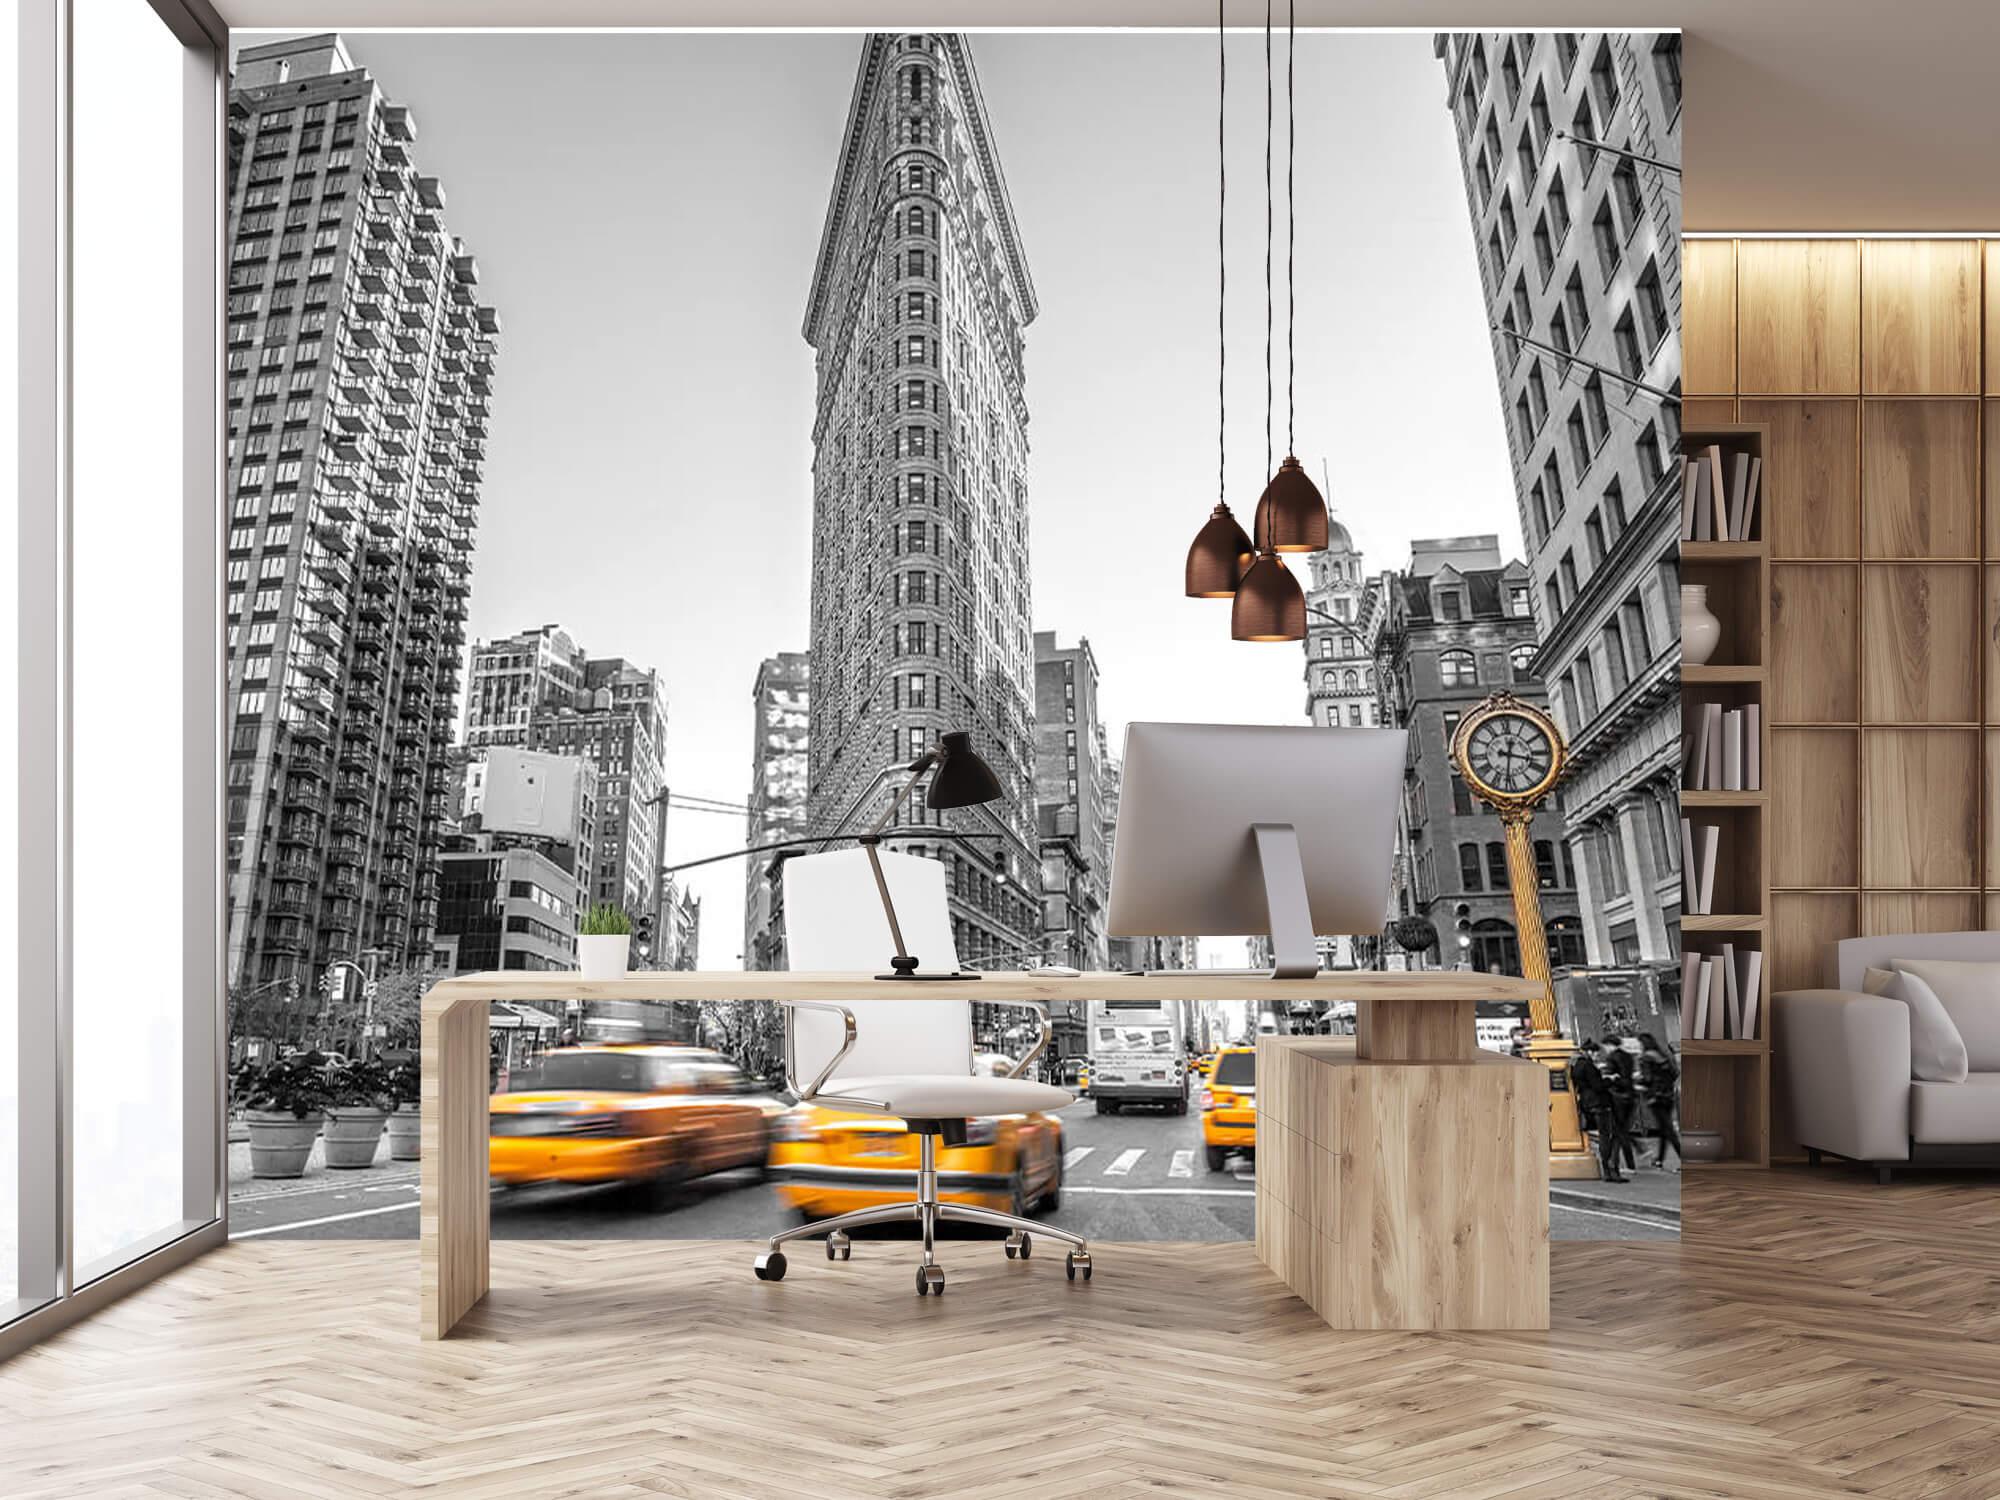 Busy street in New York 15